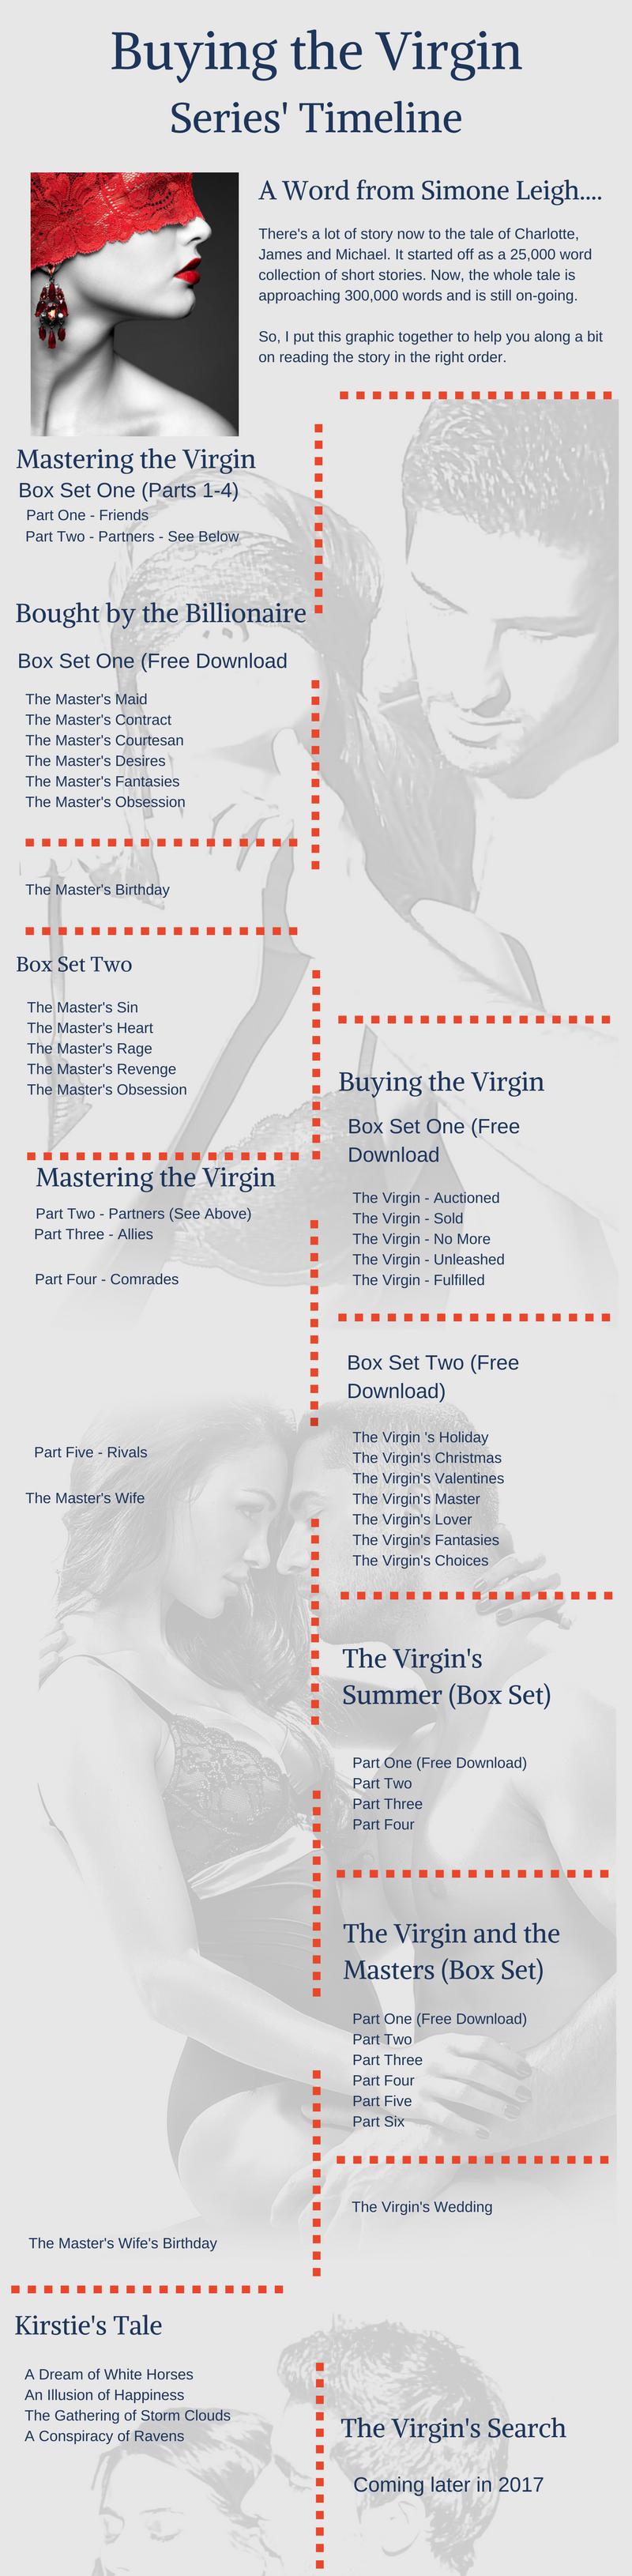 Timeline 'Buying the Virgin'